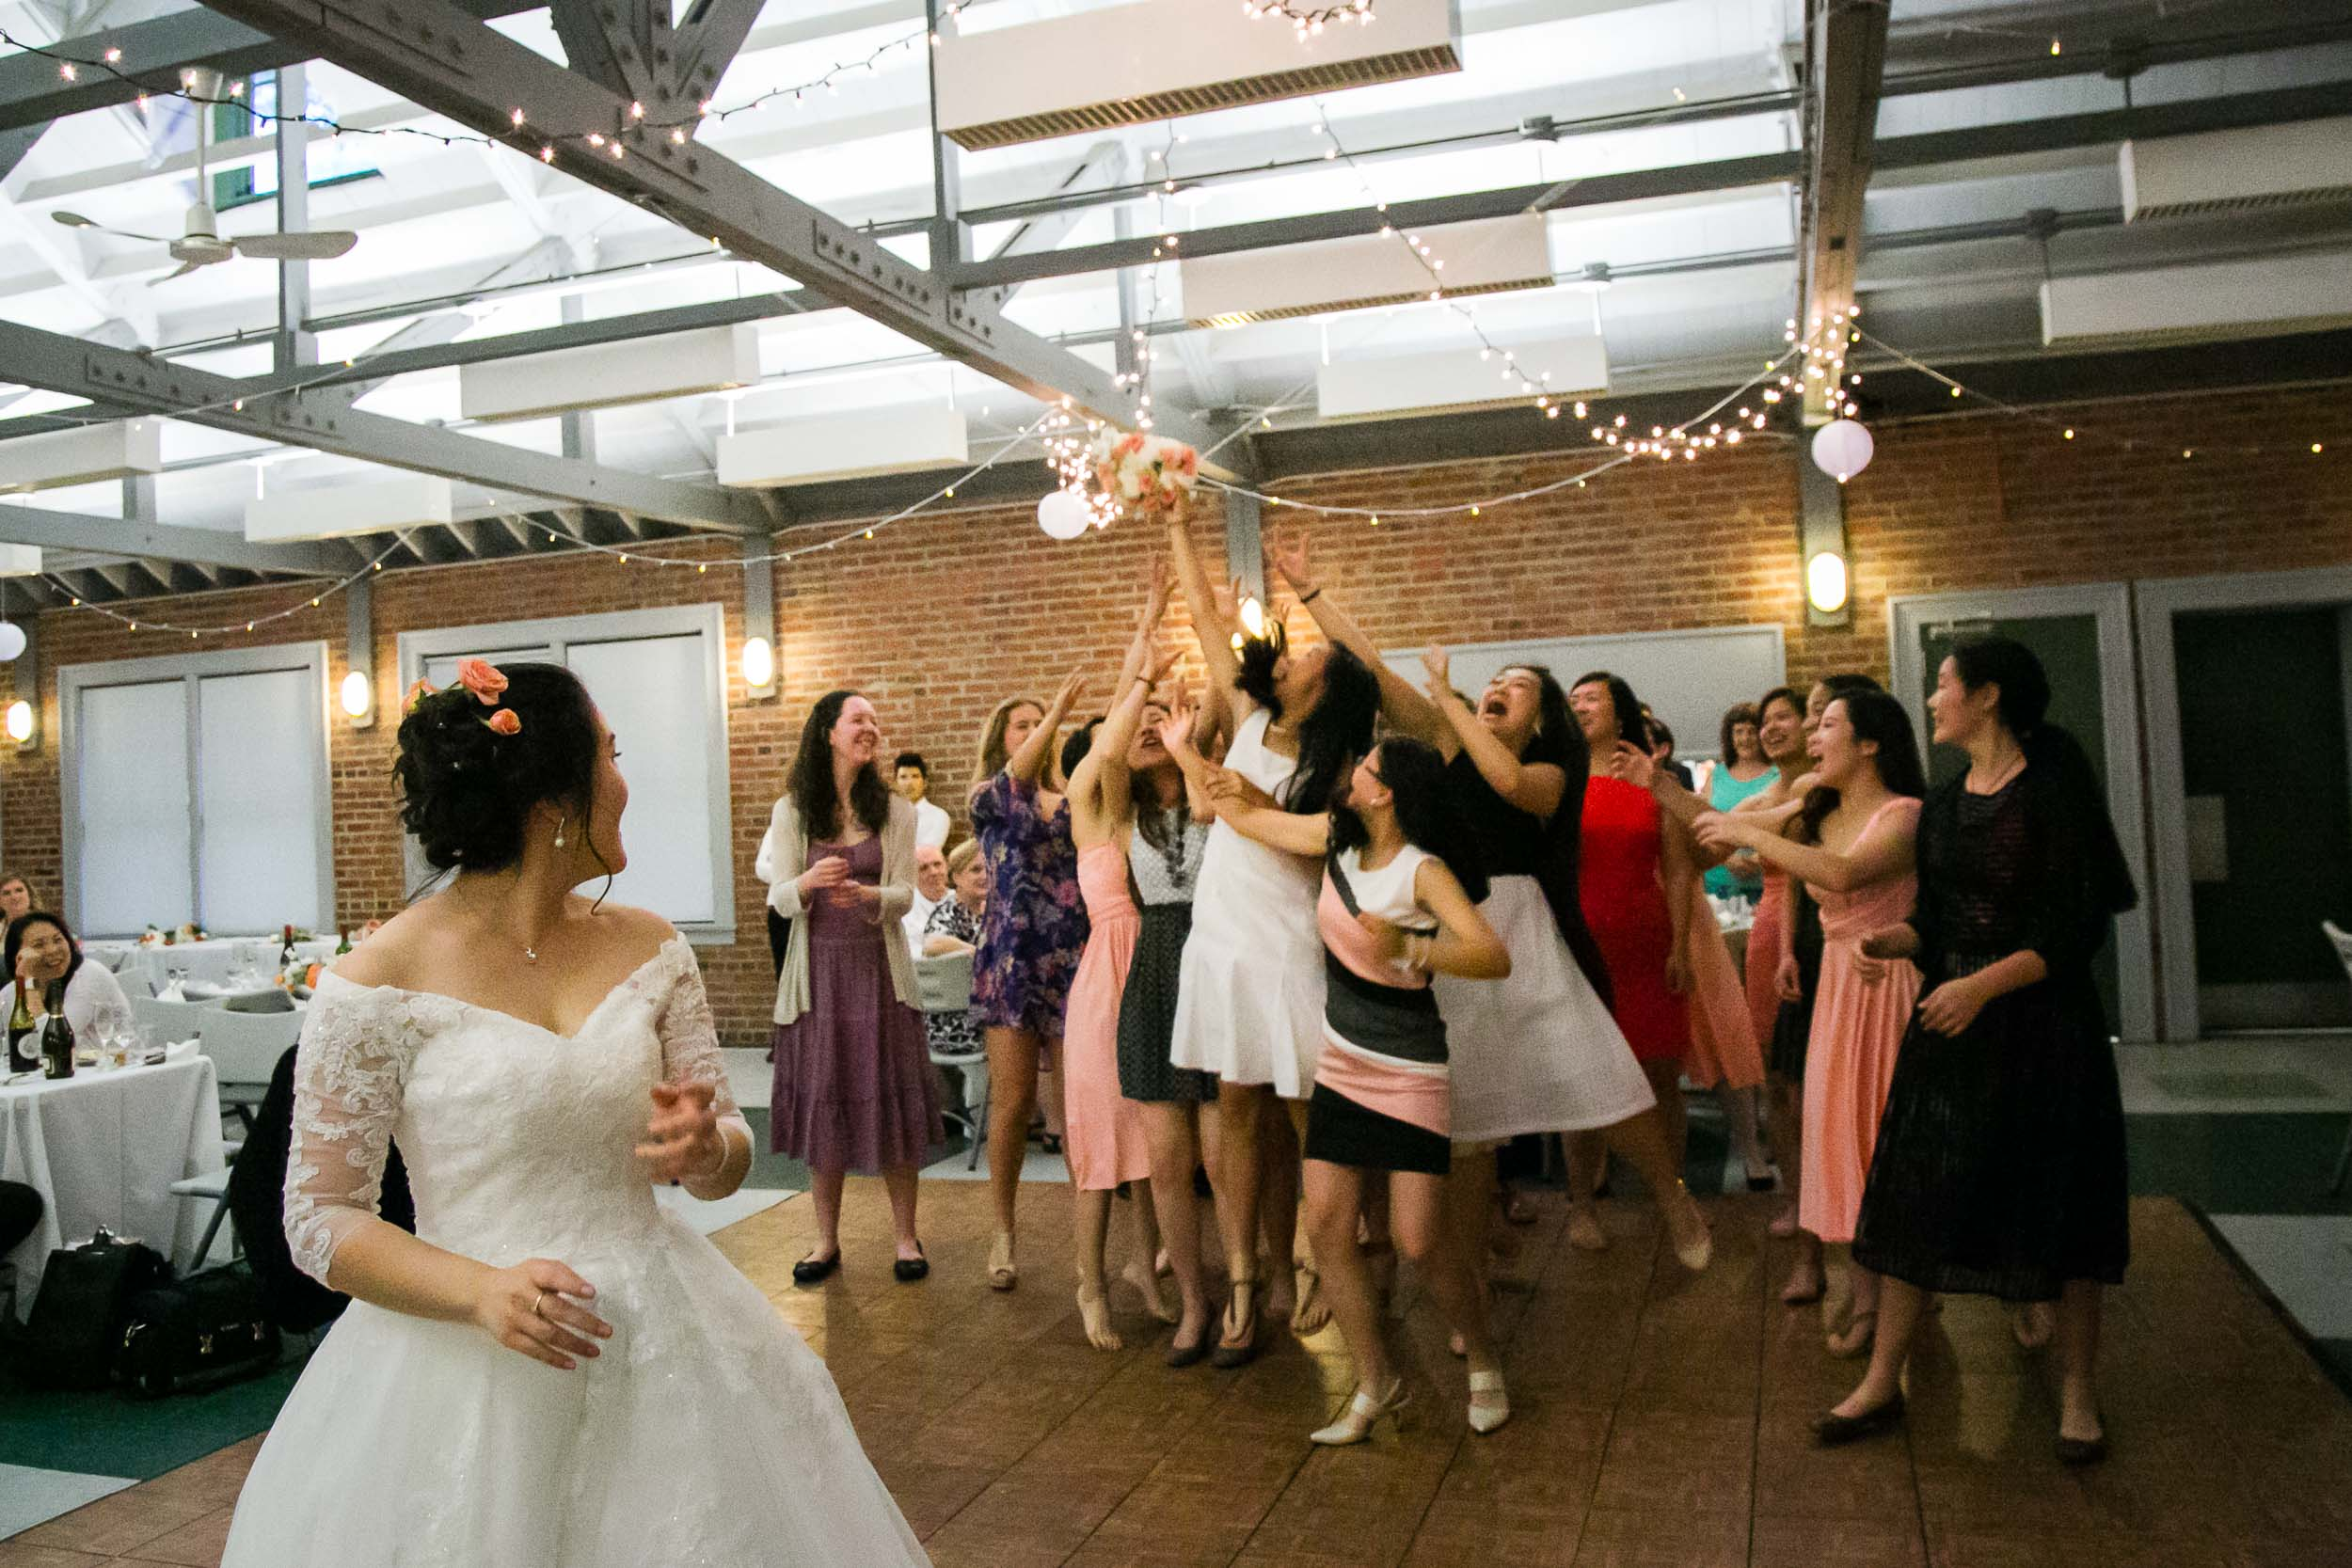 Raleigh Wedding Photographer   G. Lin Photography   Girls catching the wedding bouquet